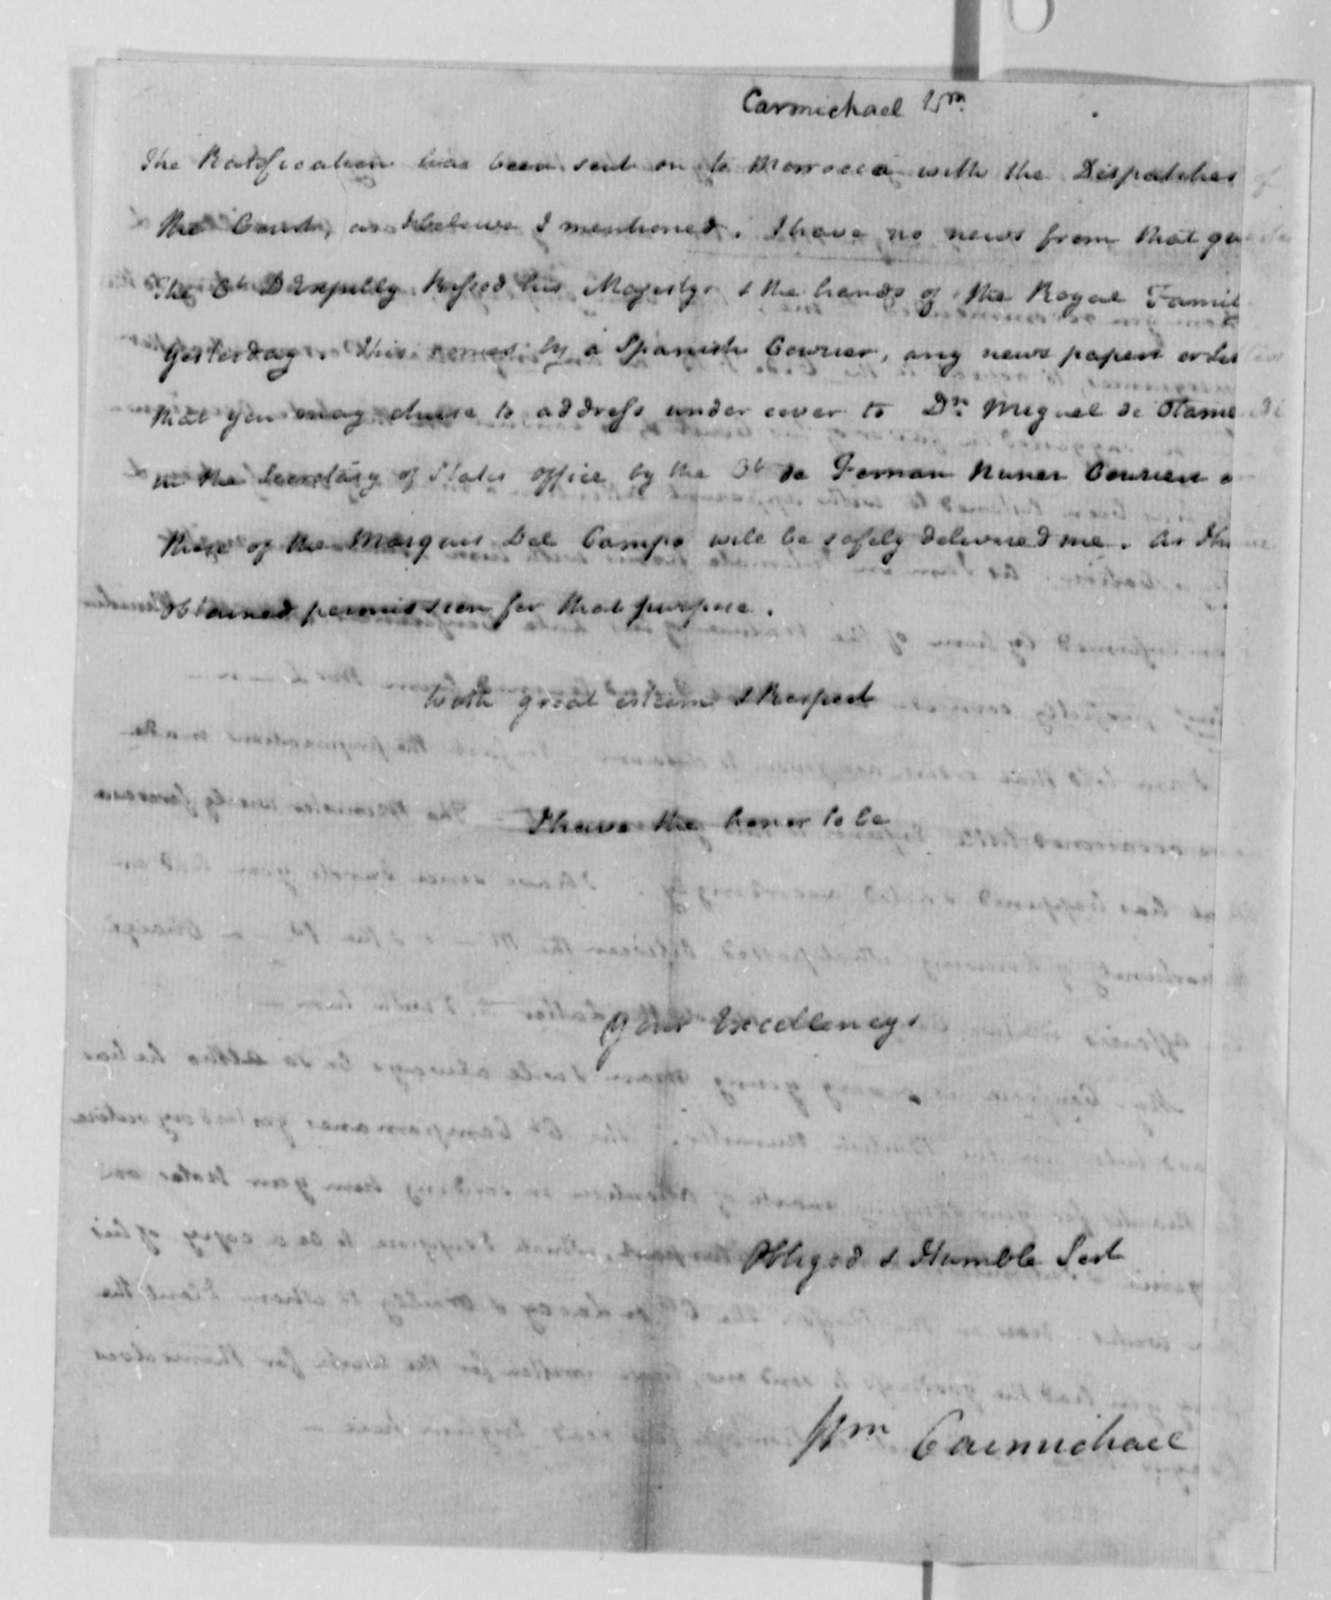 William Carmichael to Thomas Jefferson, November 14, 1787